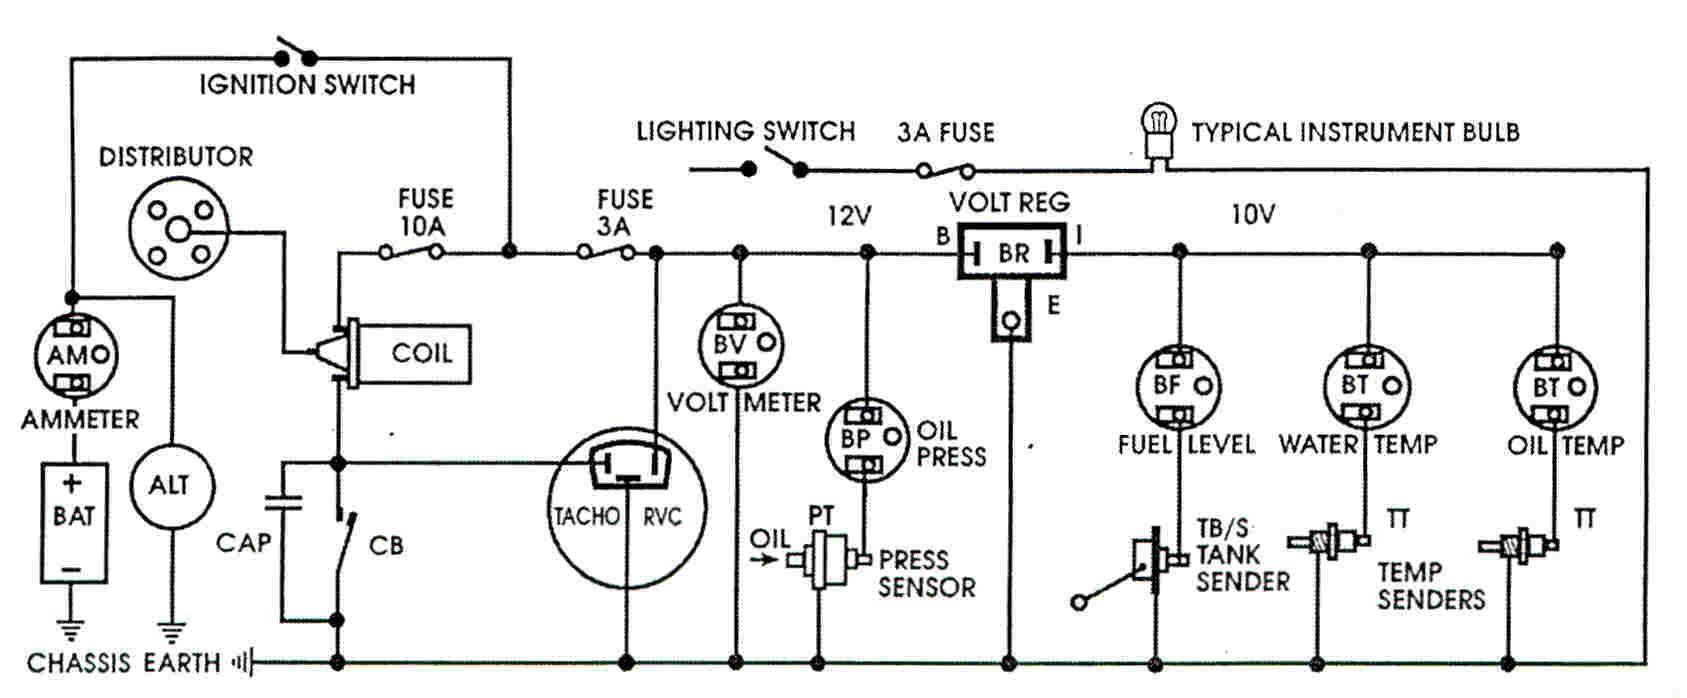 Voltage Stabilizer Wiring Diagram | Electrical & Electronics Concepts | Diagram, Floor plans